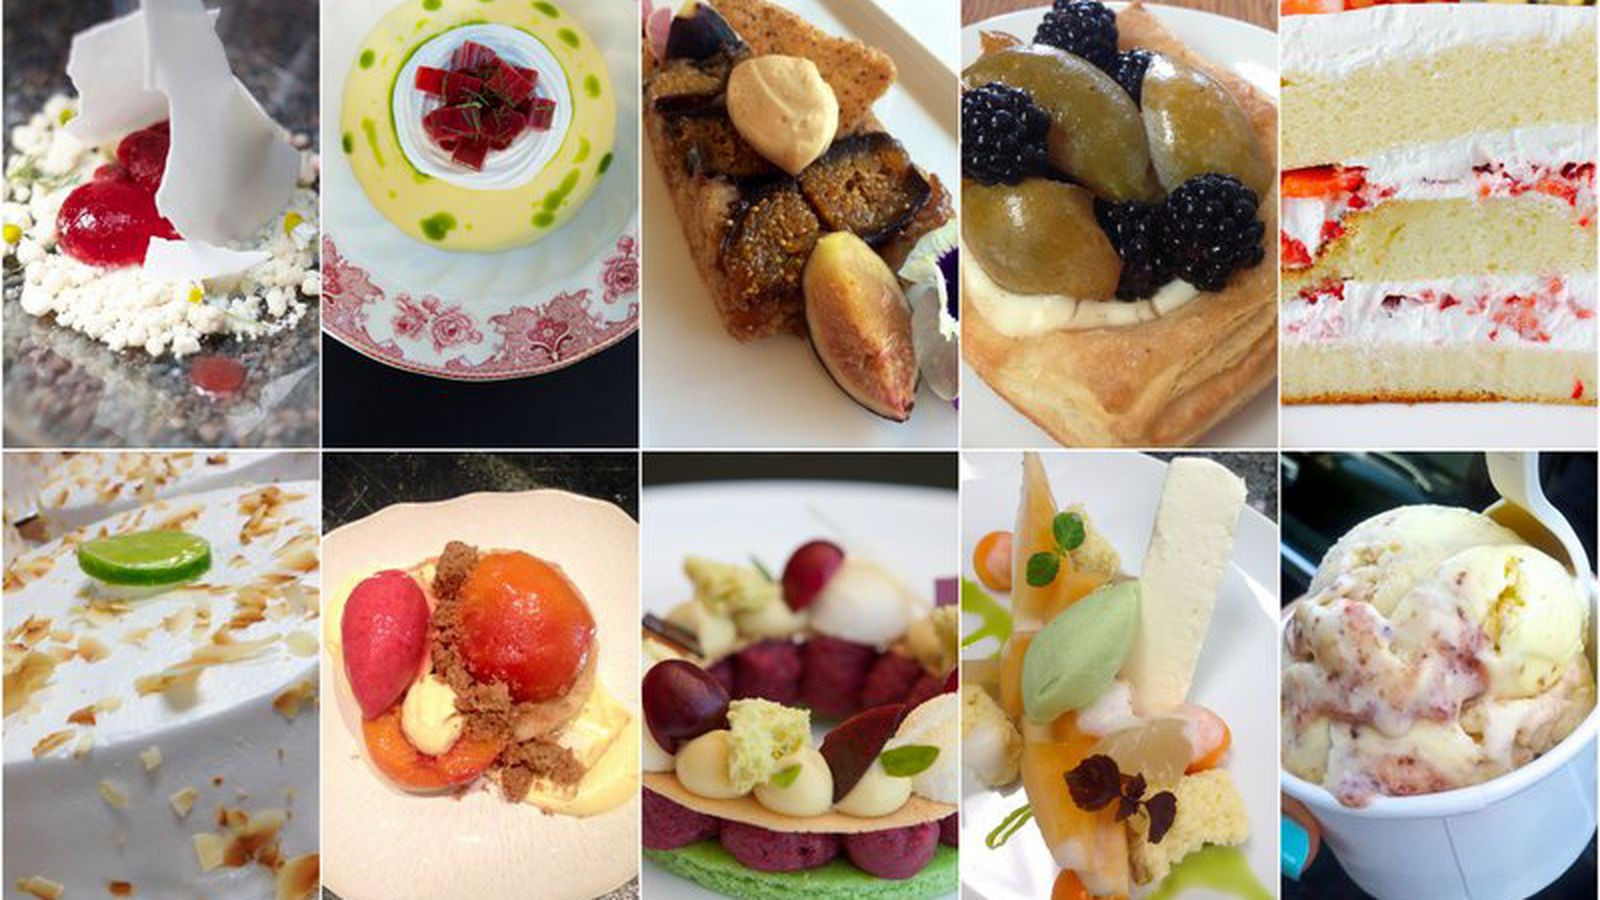 Late Summer Desserts  10 Desserts to Fend off Summertime Sadness Eater LA